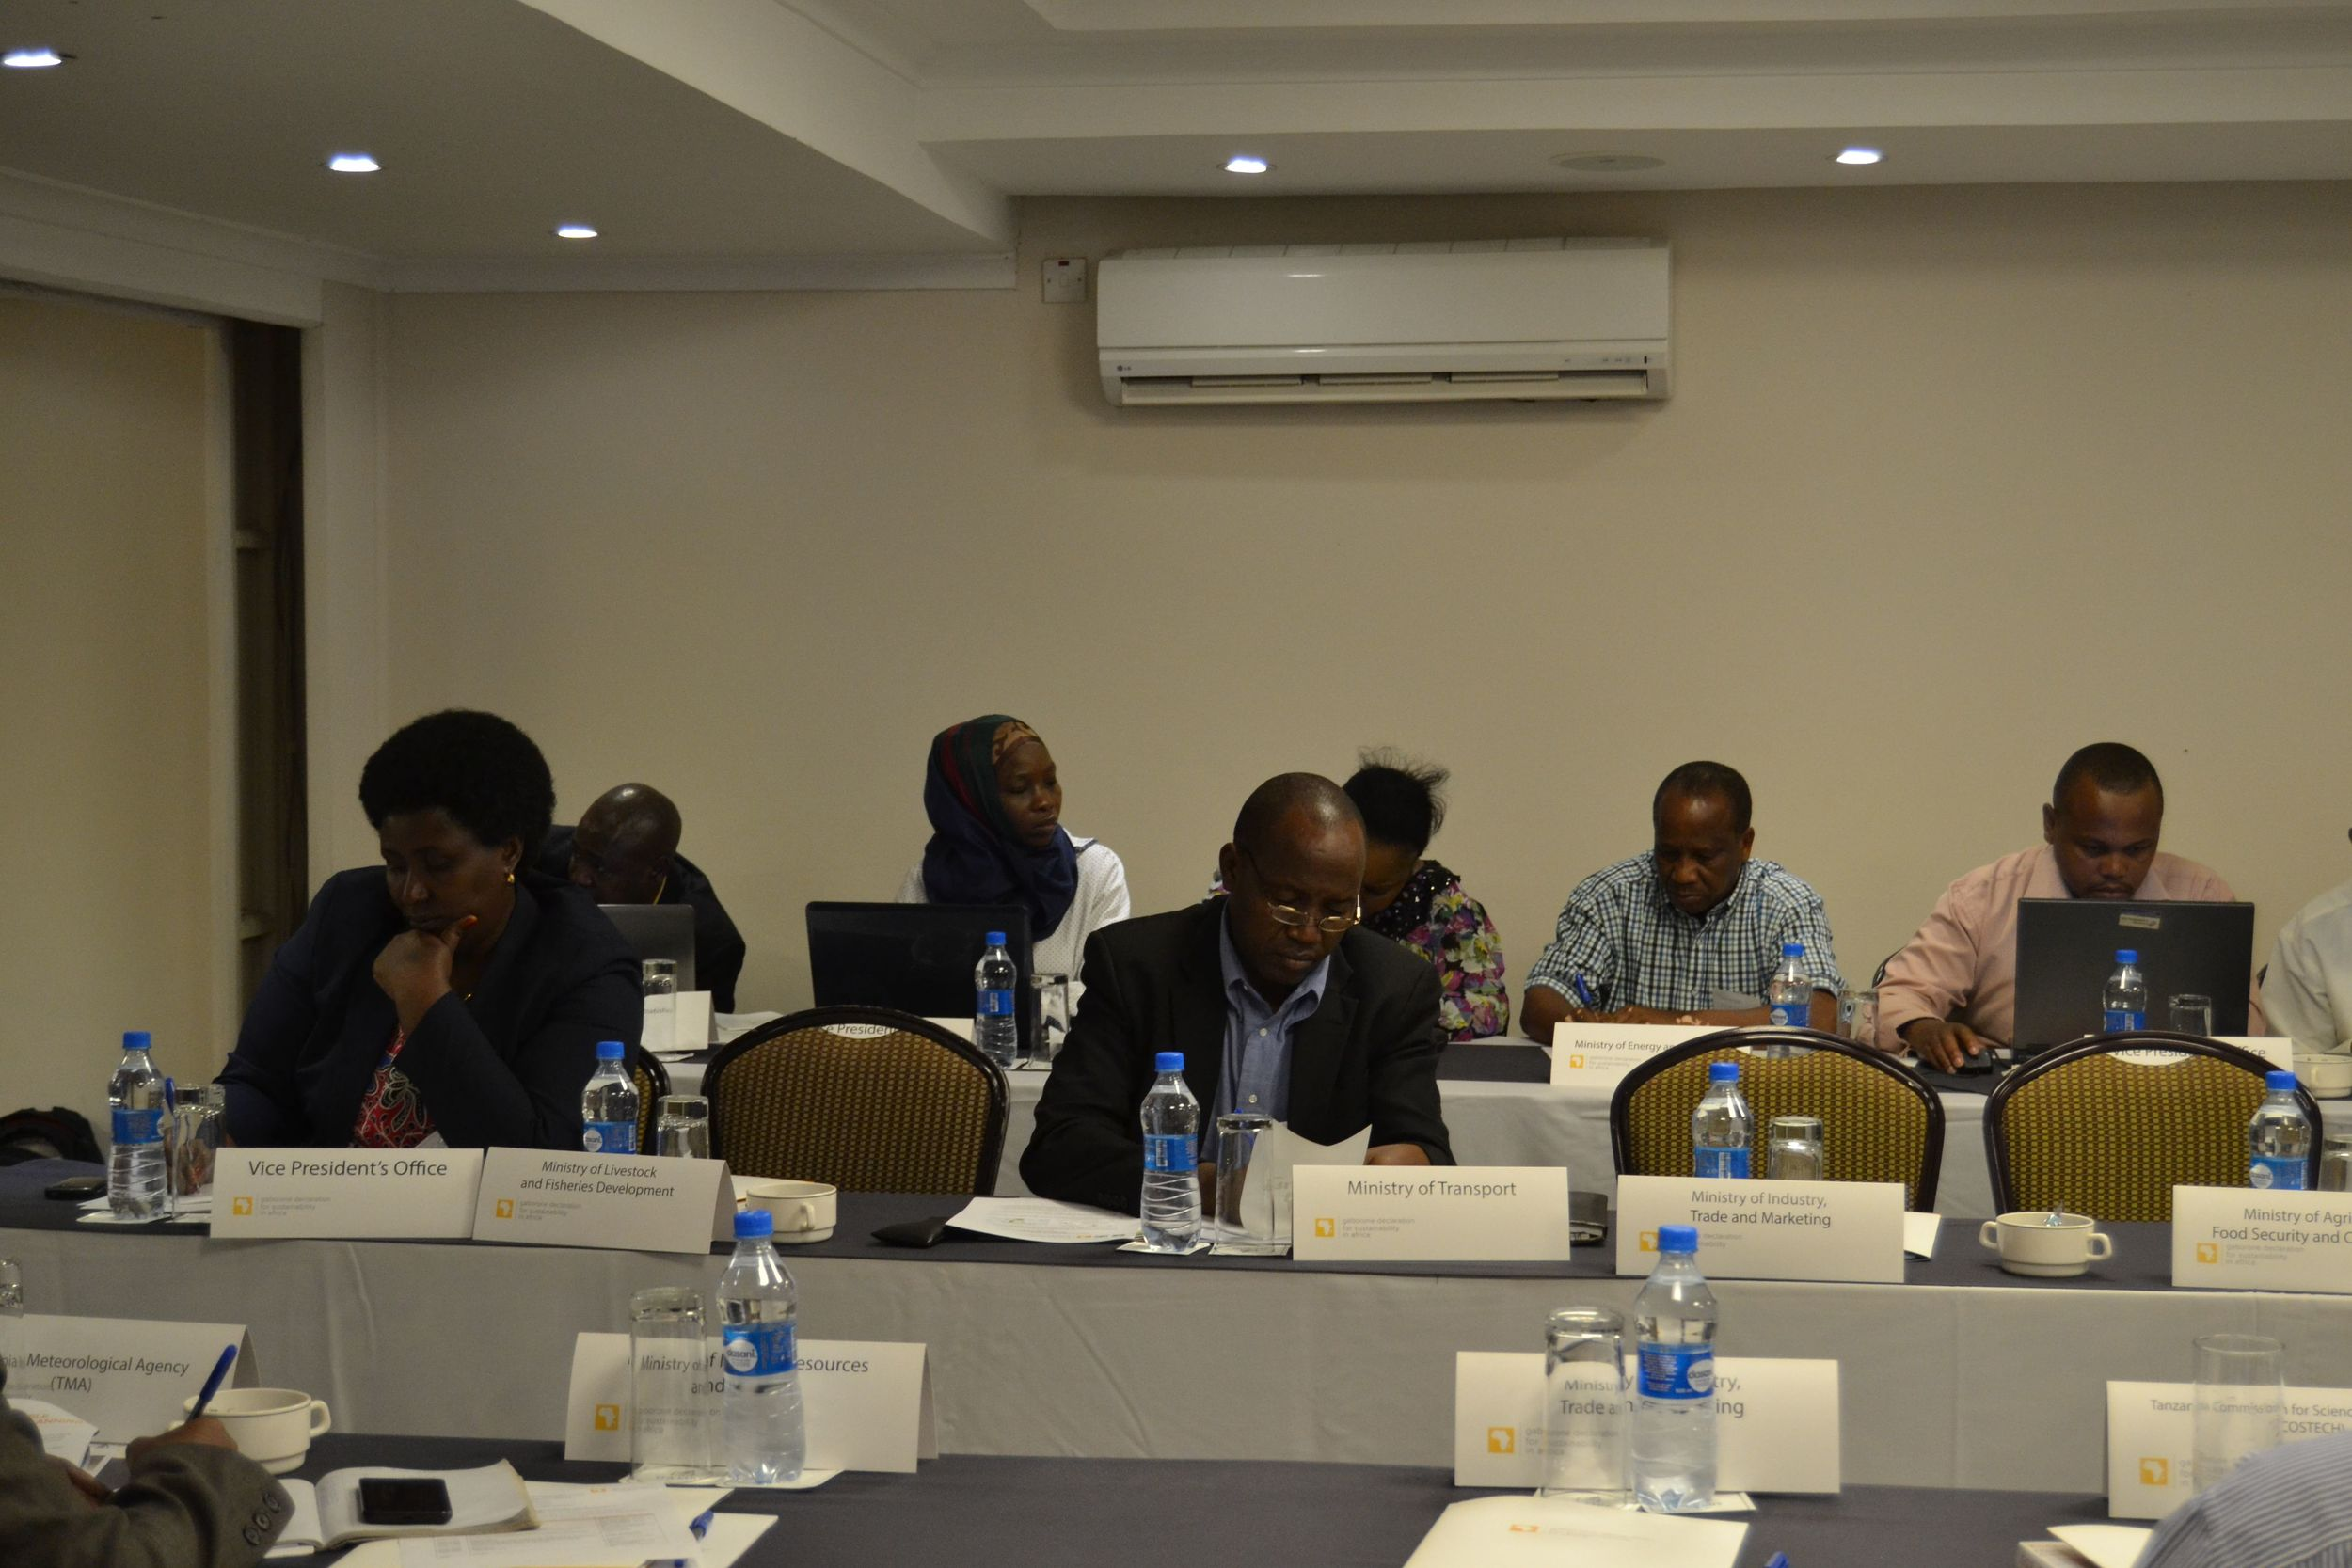 Participants at the Gaborone Declaration roadshow in Dar Es Salaam, Tanzania.